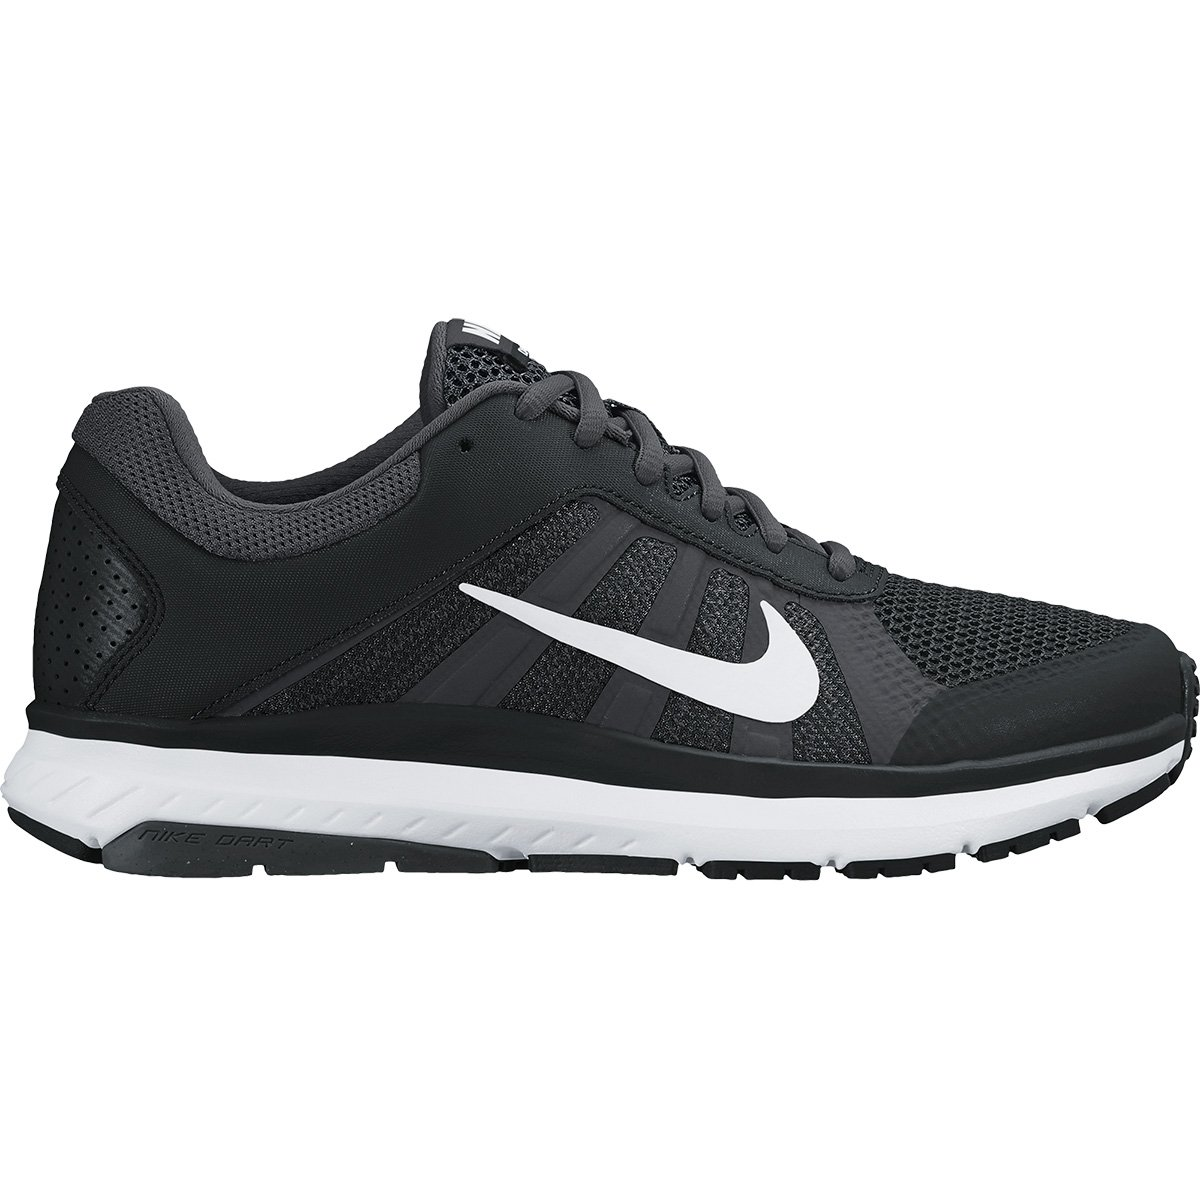 26b507bbc3 12 e Dart Nike Feminino MSL Branco Preto Tênis Nike Tênis USWnqwIST ...